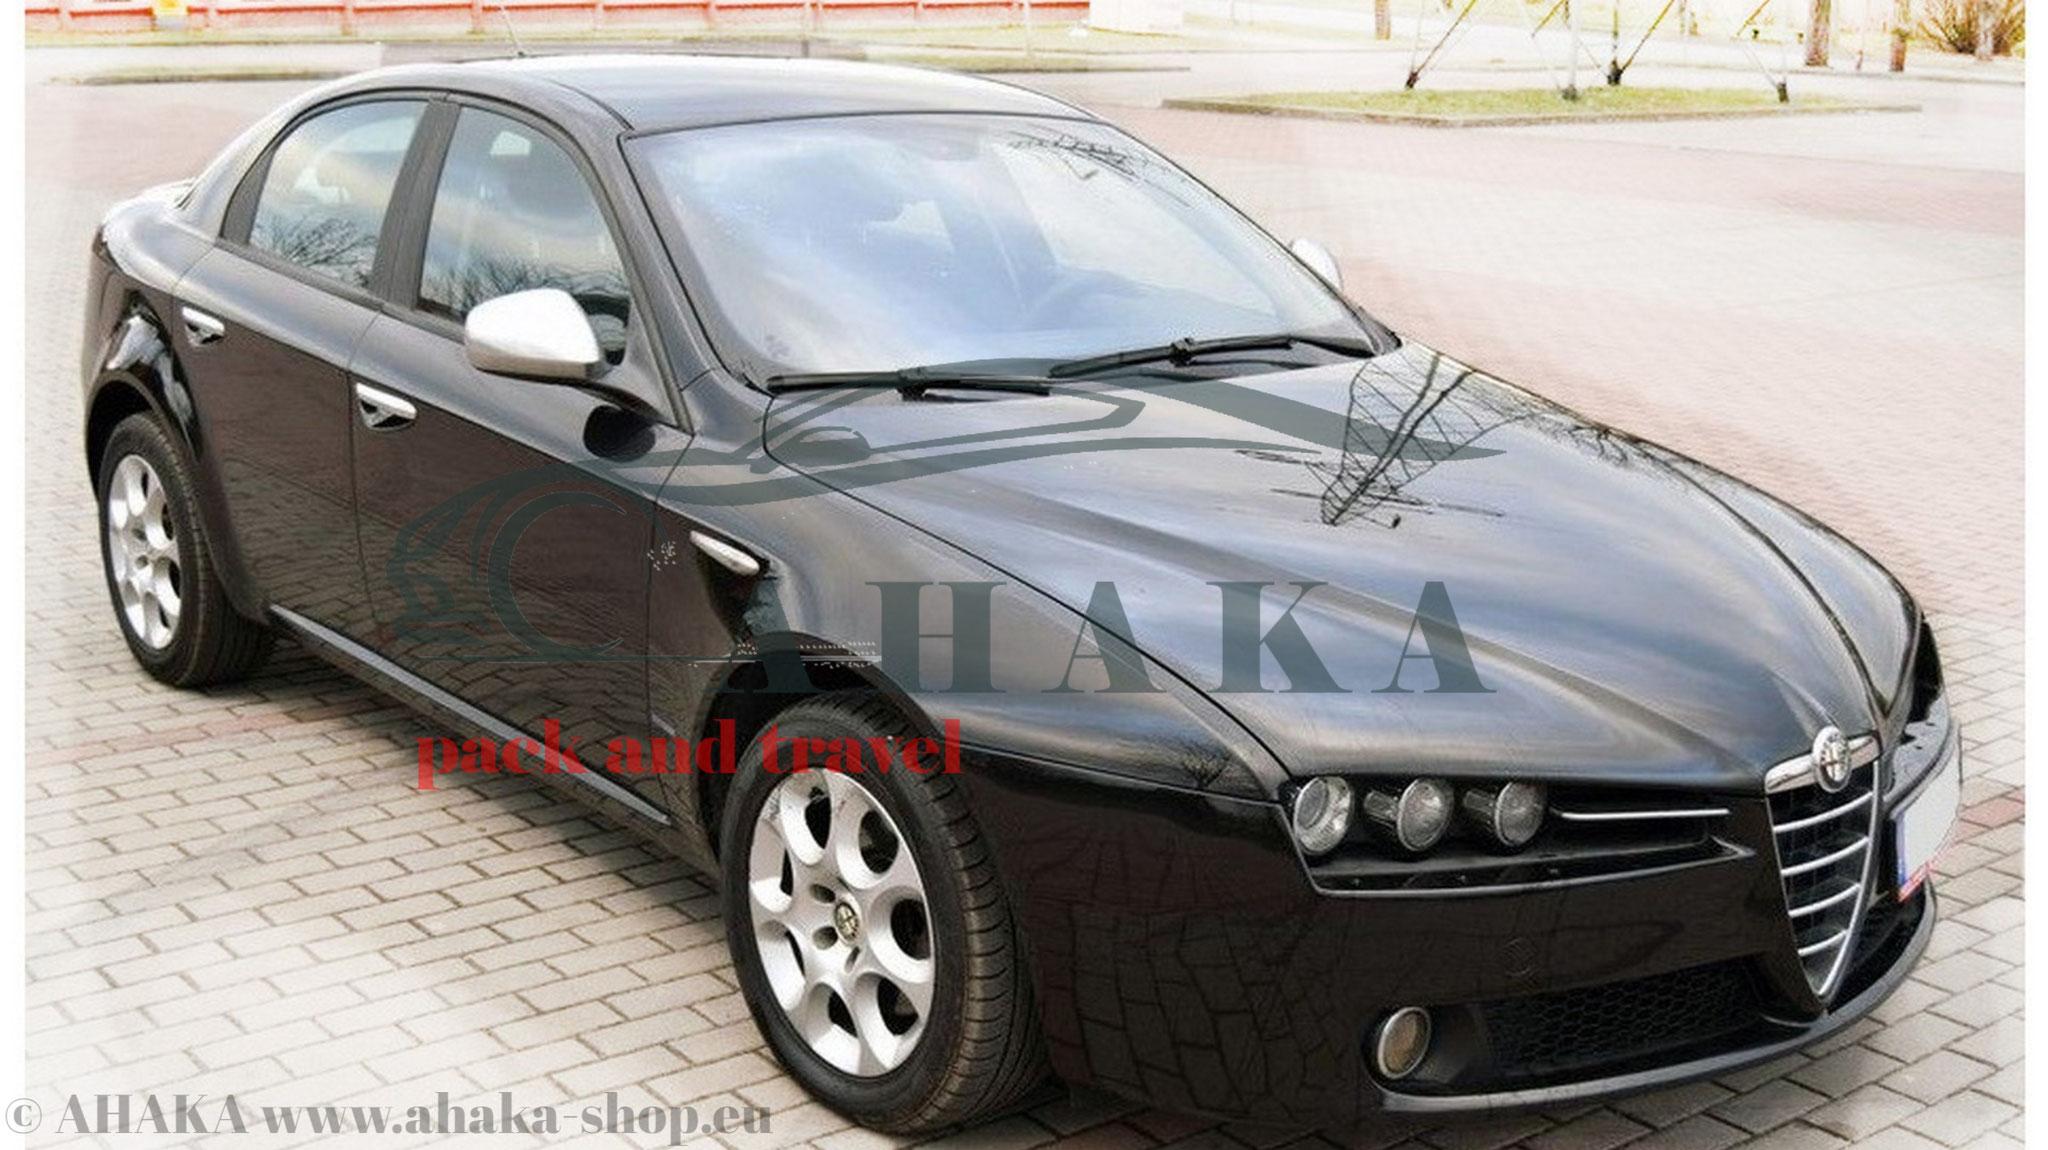 Horizontal Abnehmbar Anhängerkupplung für Alfa Romeo GT Coupe ab 2004 13pol